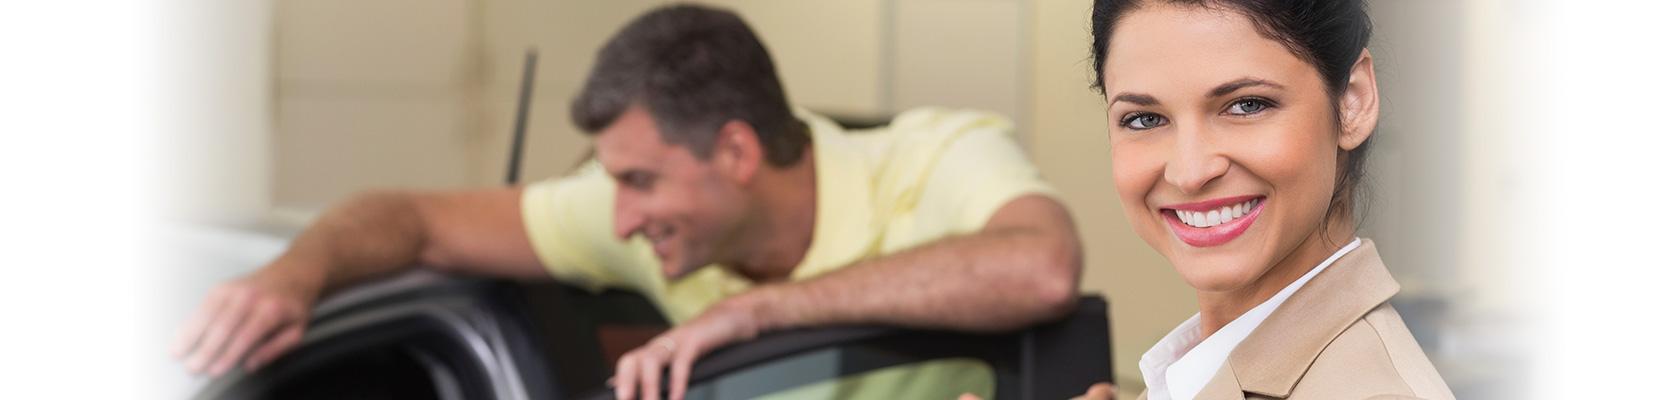 sc 1 st  Trinity Auto Group & Careers at Trinity Auto Group Cairns - Trinity Auto Group markmcfarlin.com